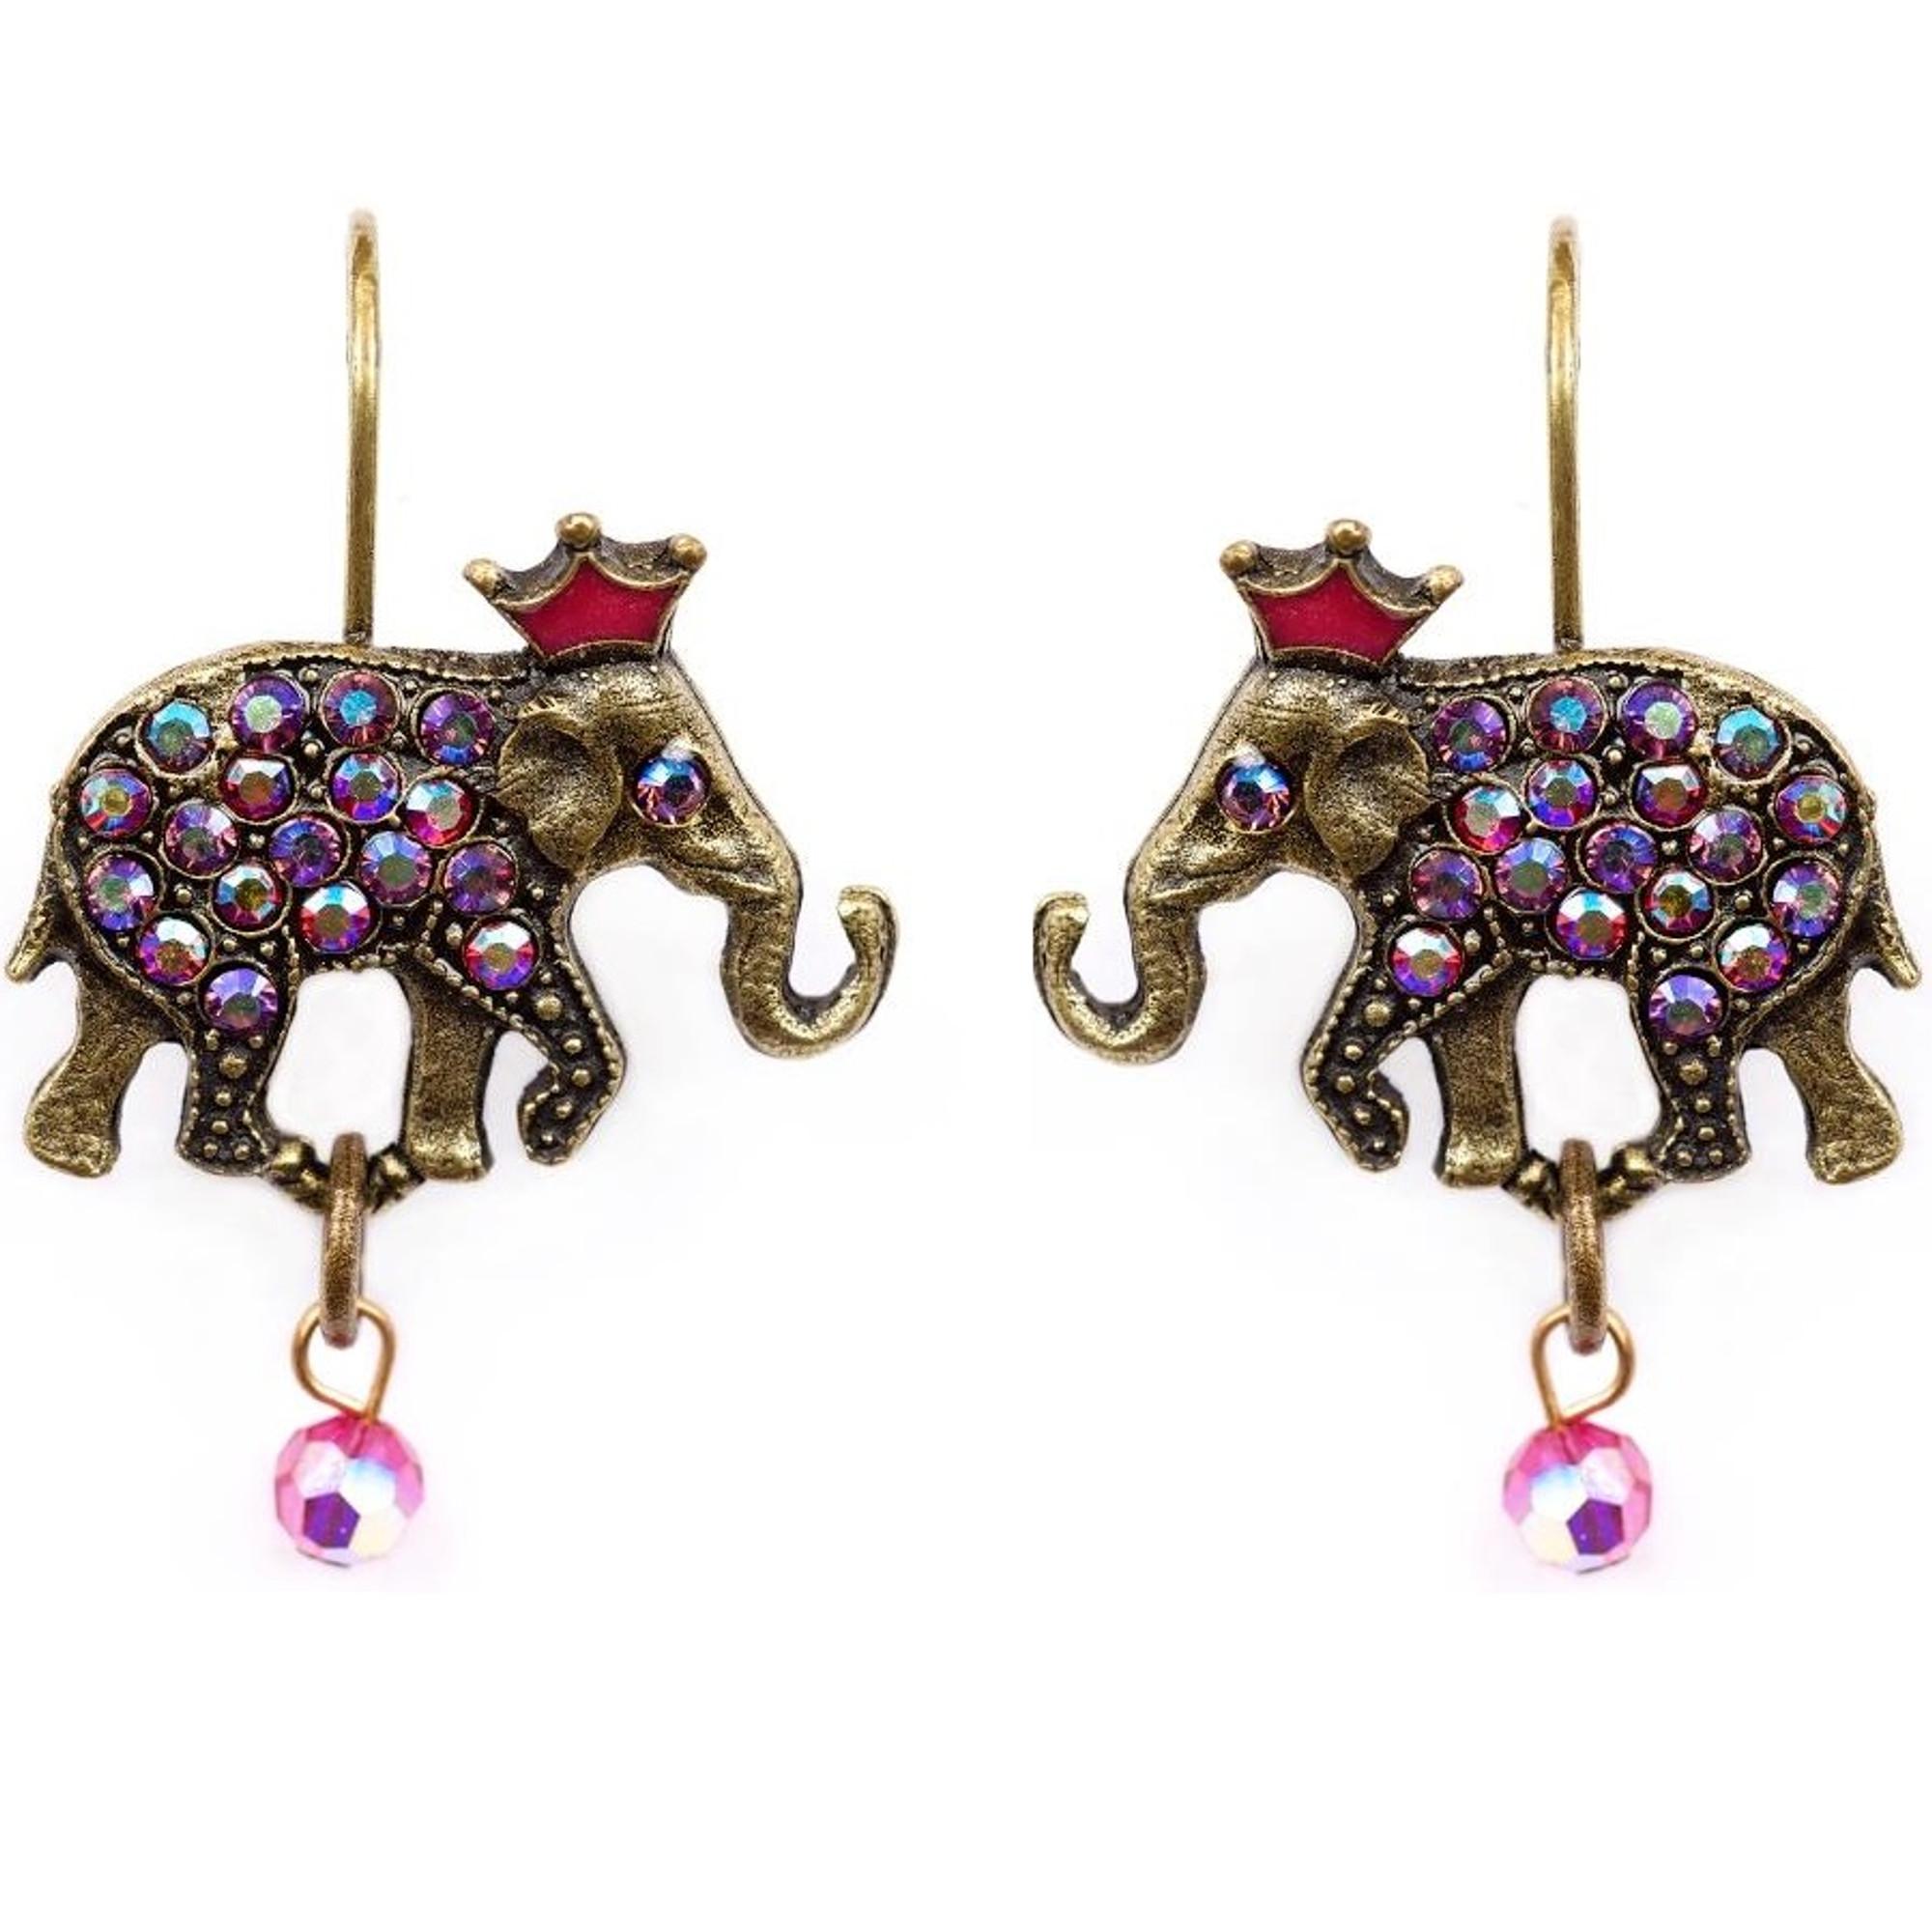 Elephant With Crown Earrings La Contessa Jewelry Mary